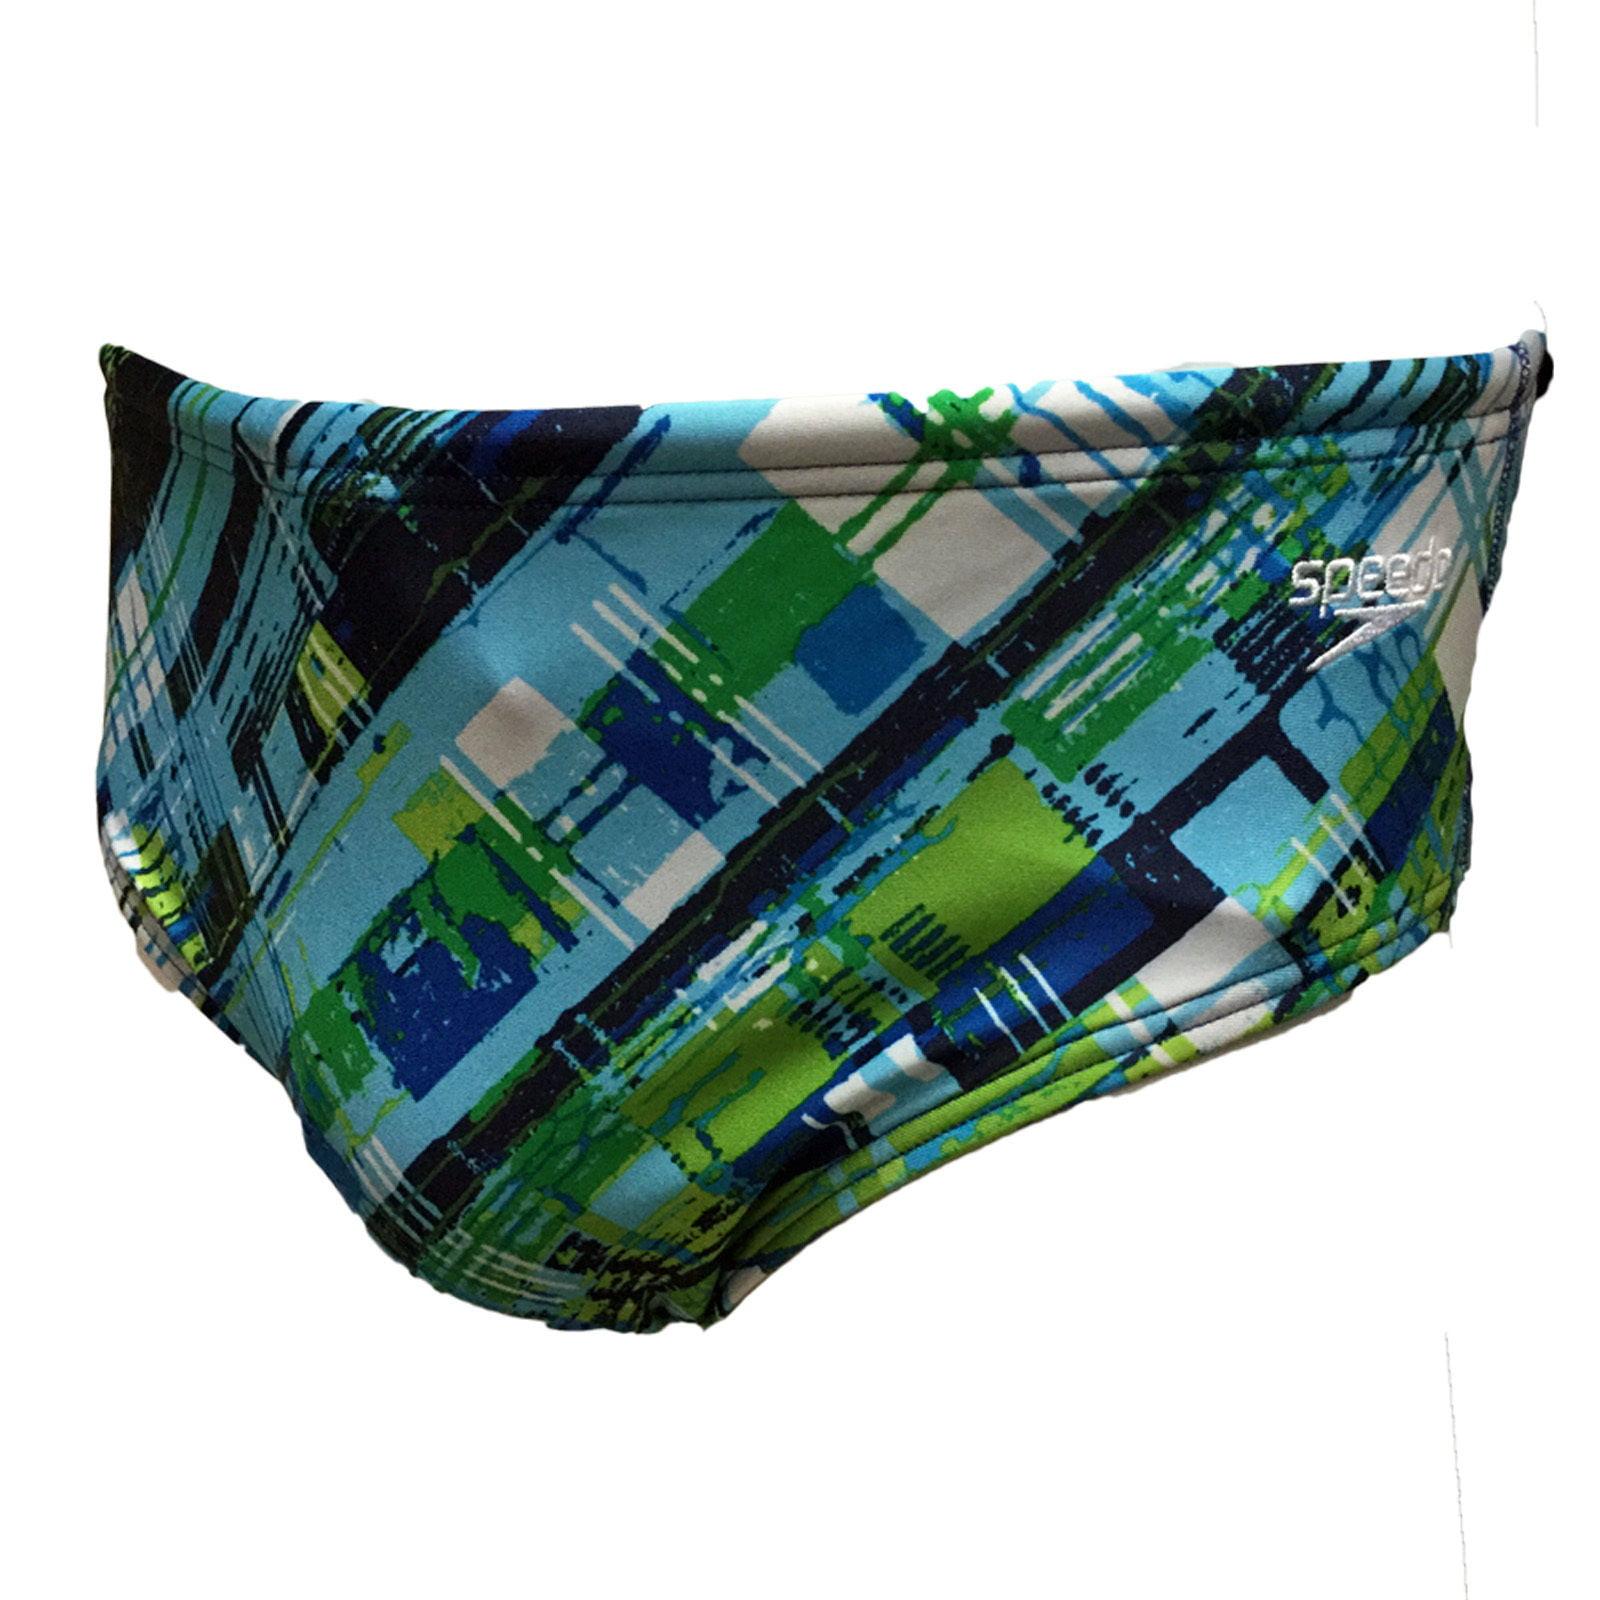 c612bbdc0 Speedo Men's Competitive Plaid Swimsuit Active Trunk Short Briefs 8051371